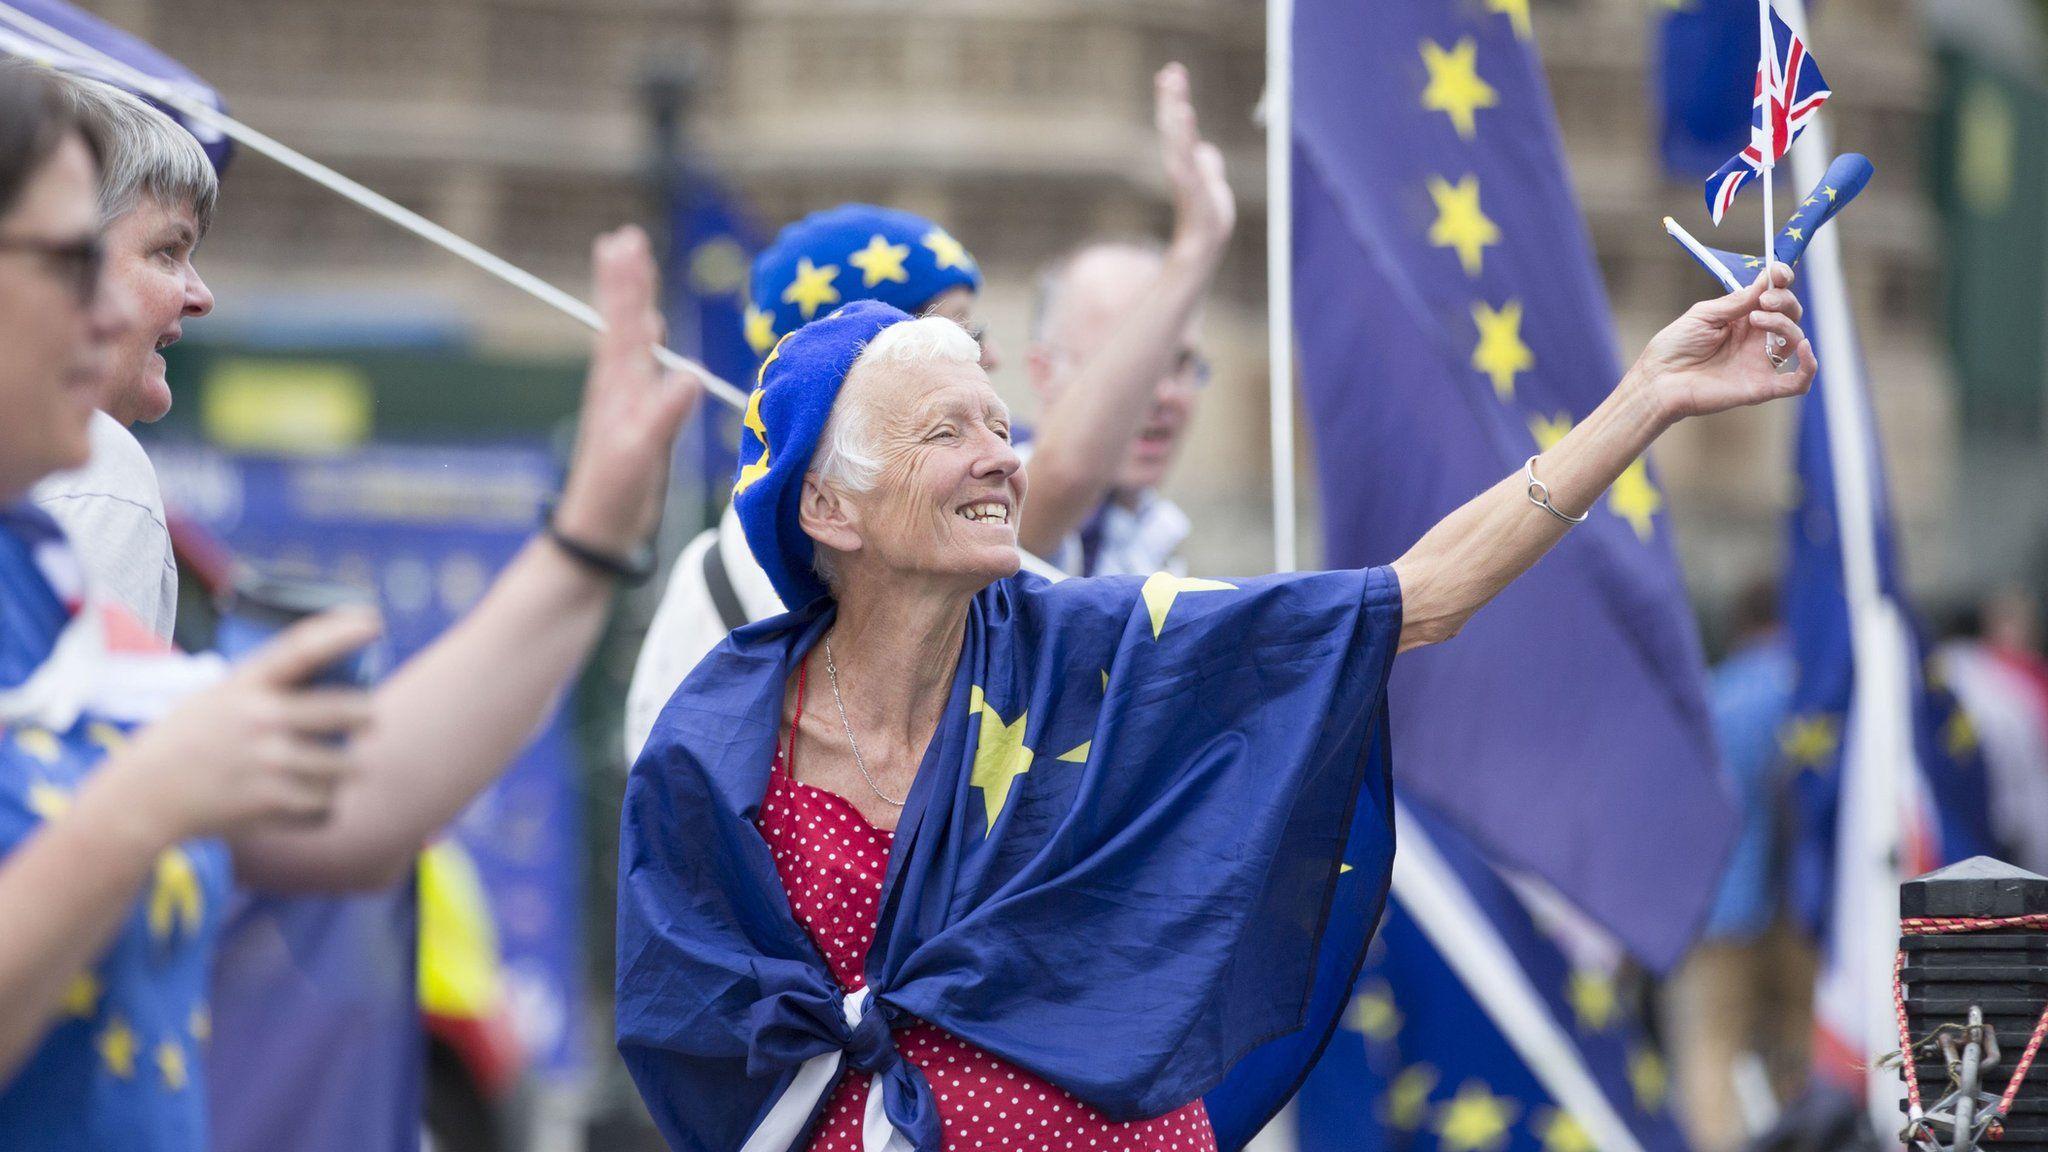 Stop Brexit campaigners